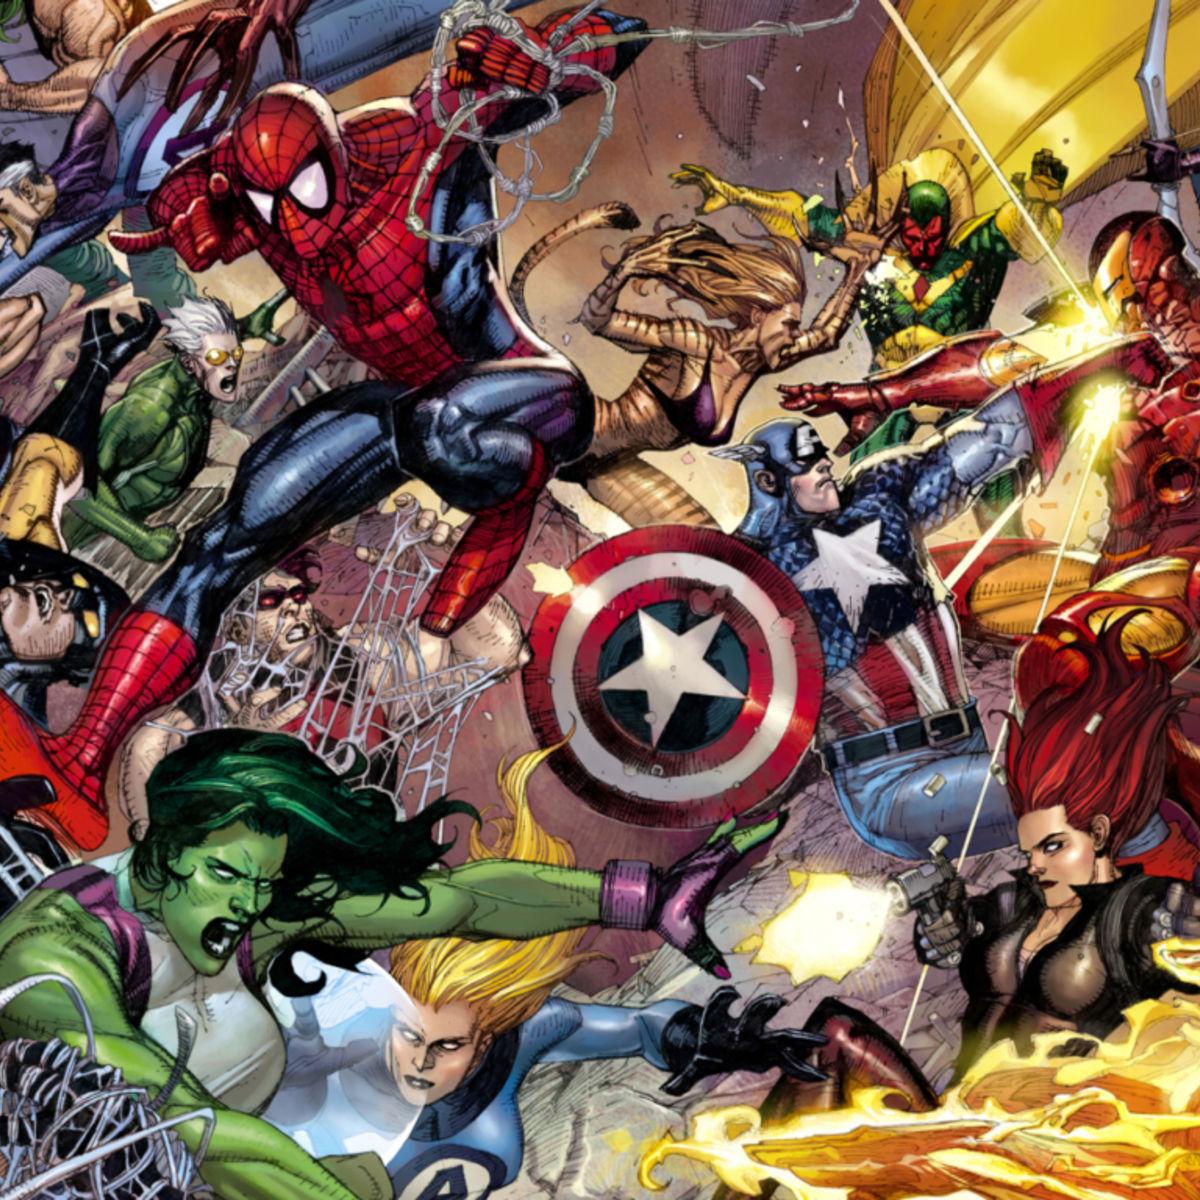 Civil_War_Marvel_Comics.jpg